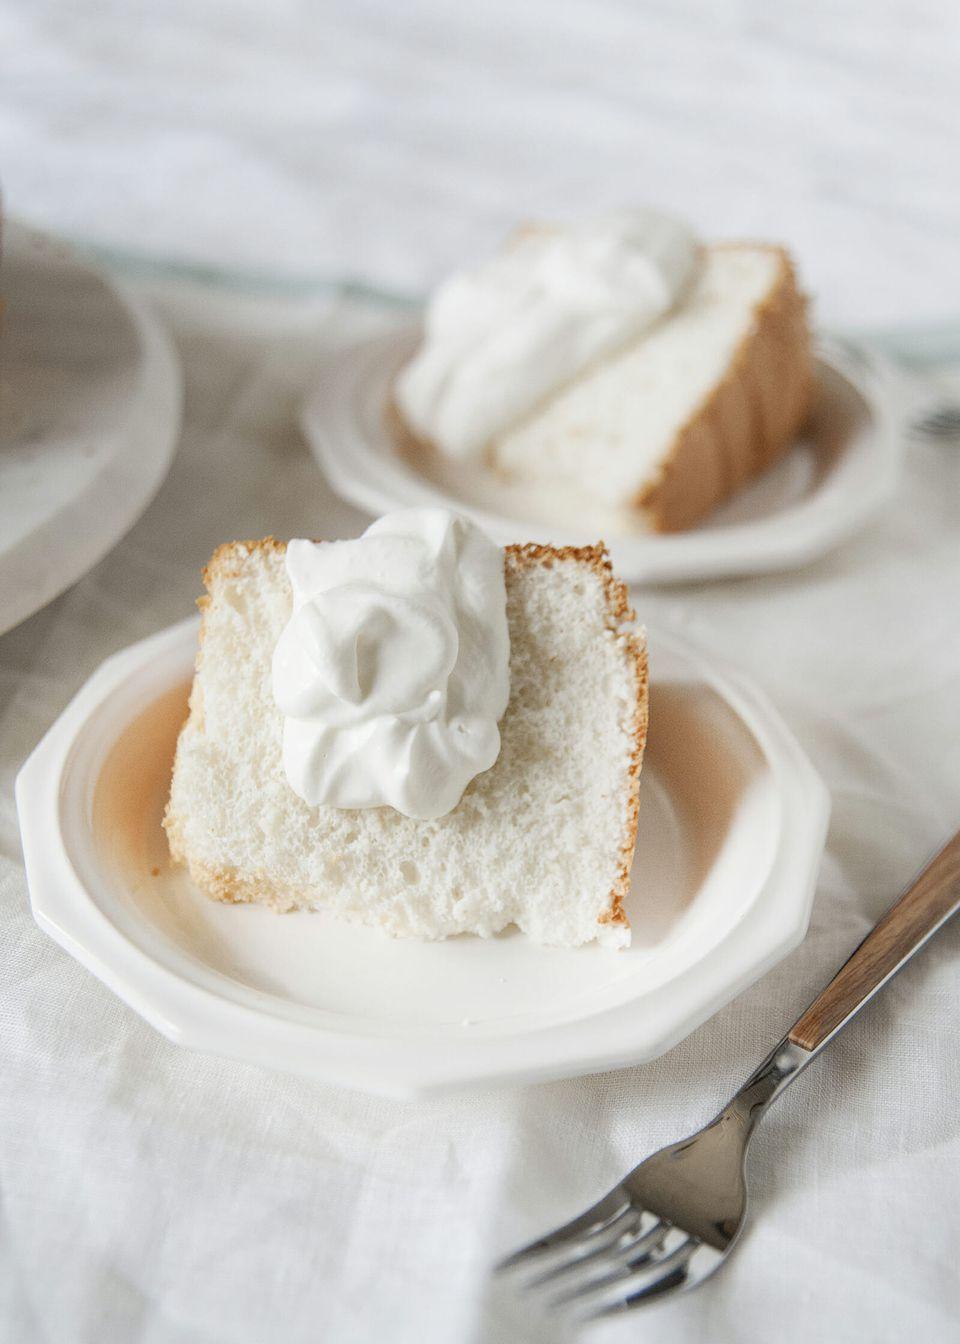 Homemade angel food cake